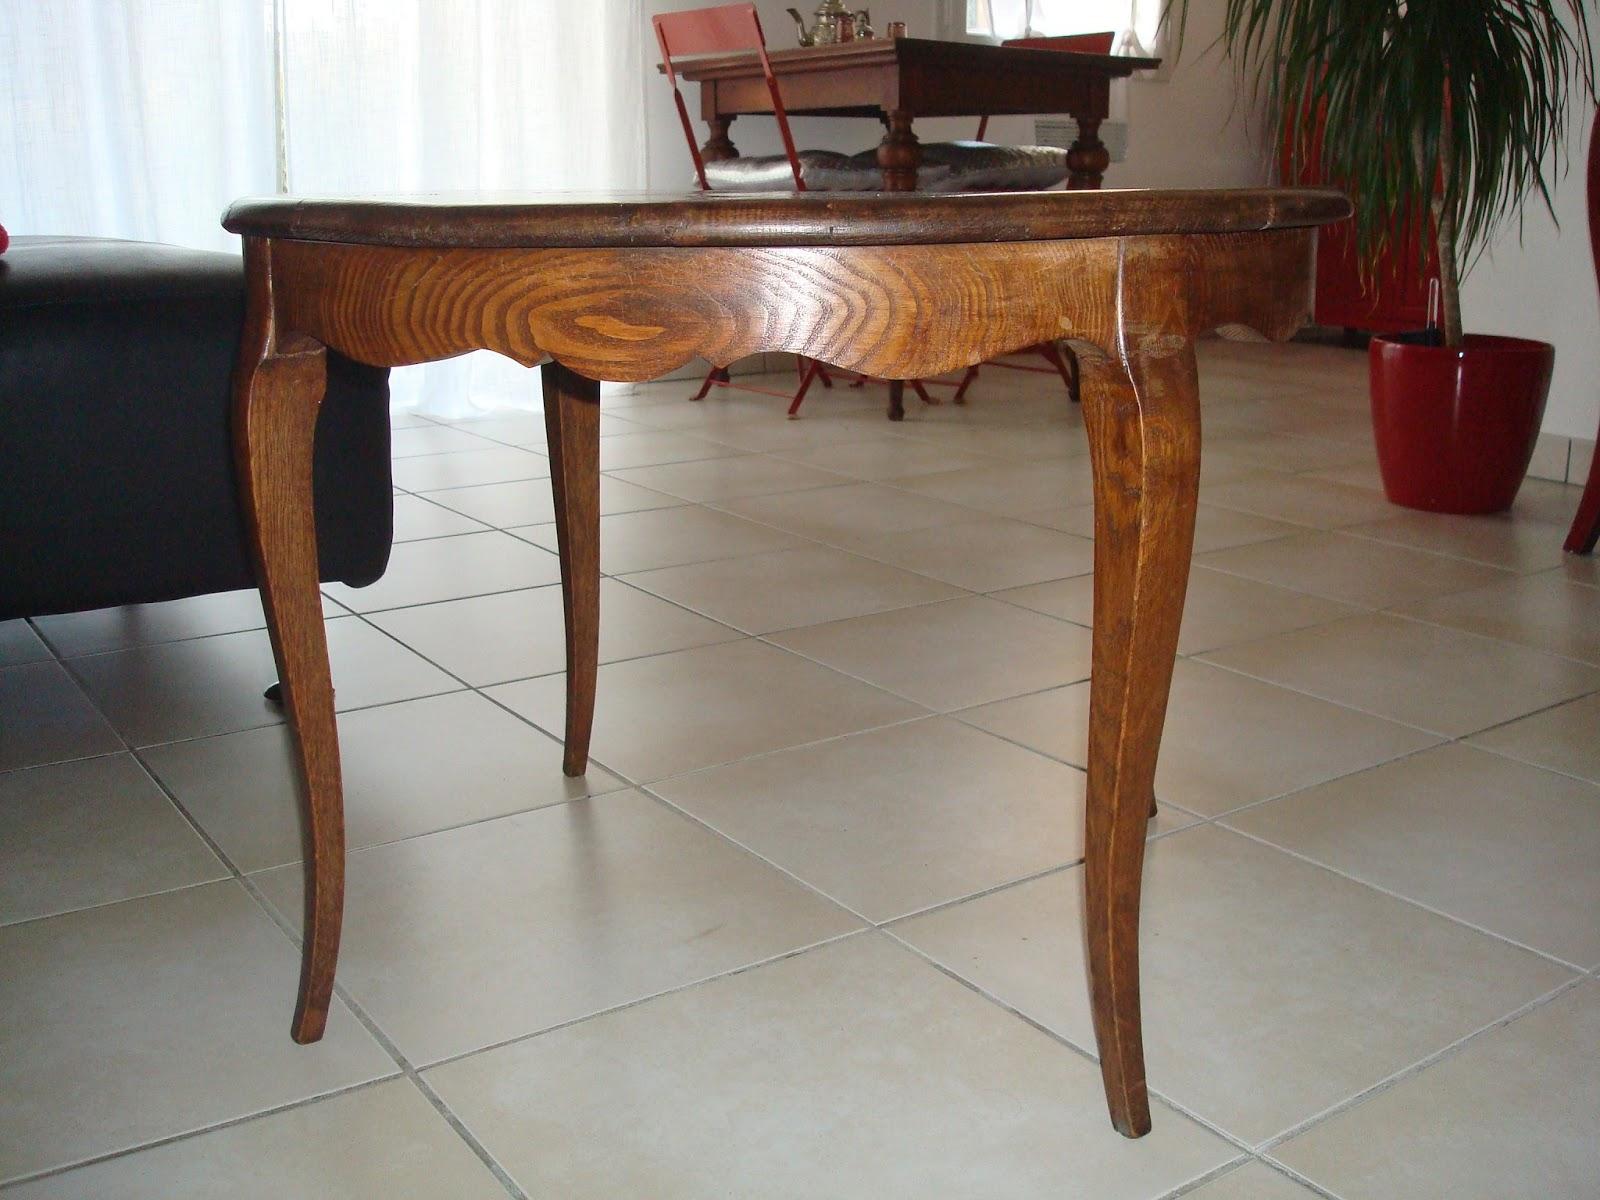 la d co d 39 alia table basse relook e. Black Bedroom Furniture Sets. Home Design Ideas